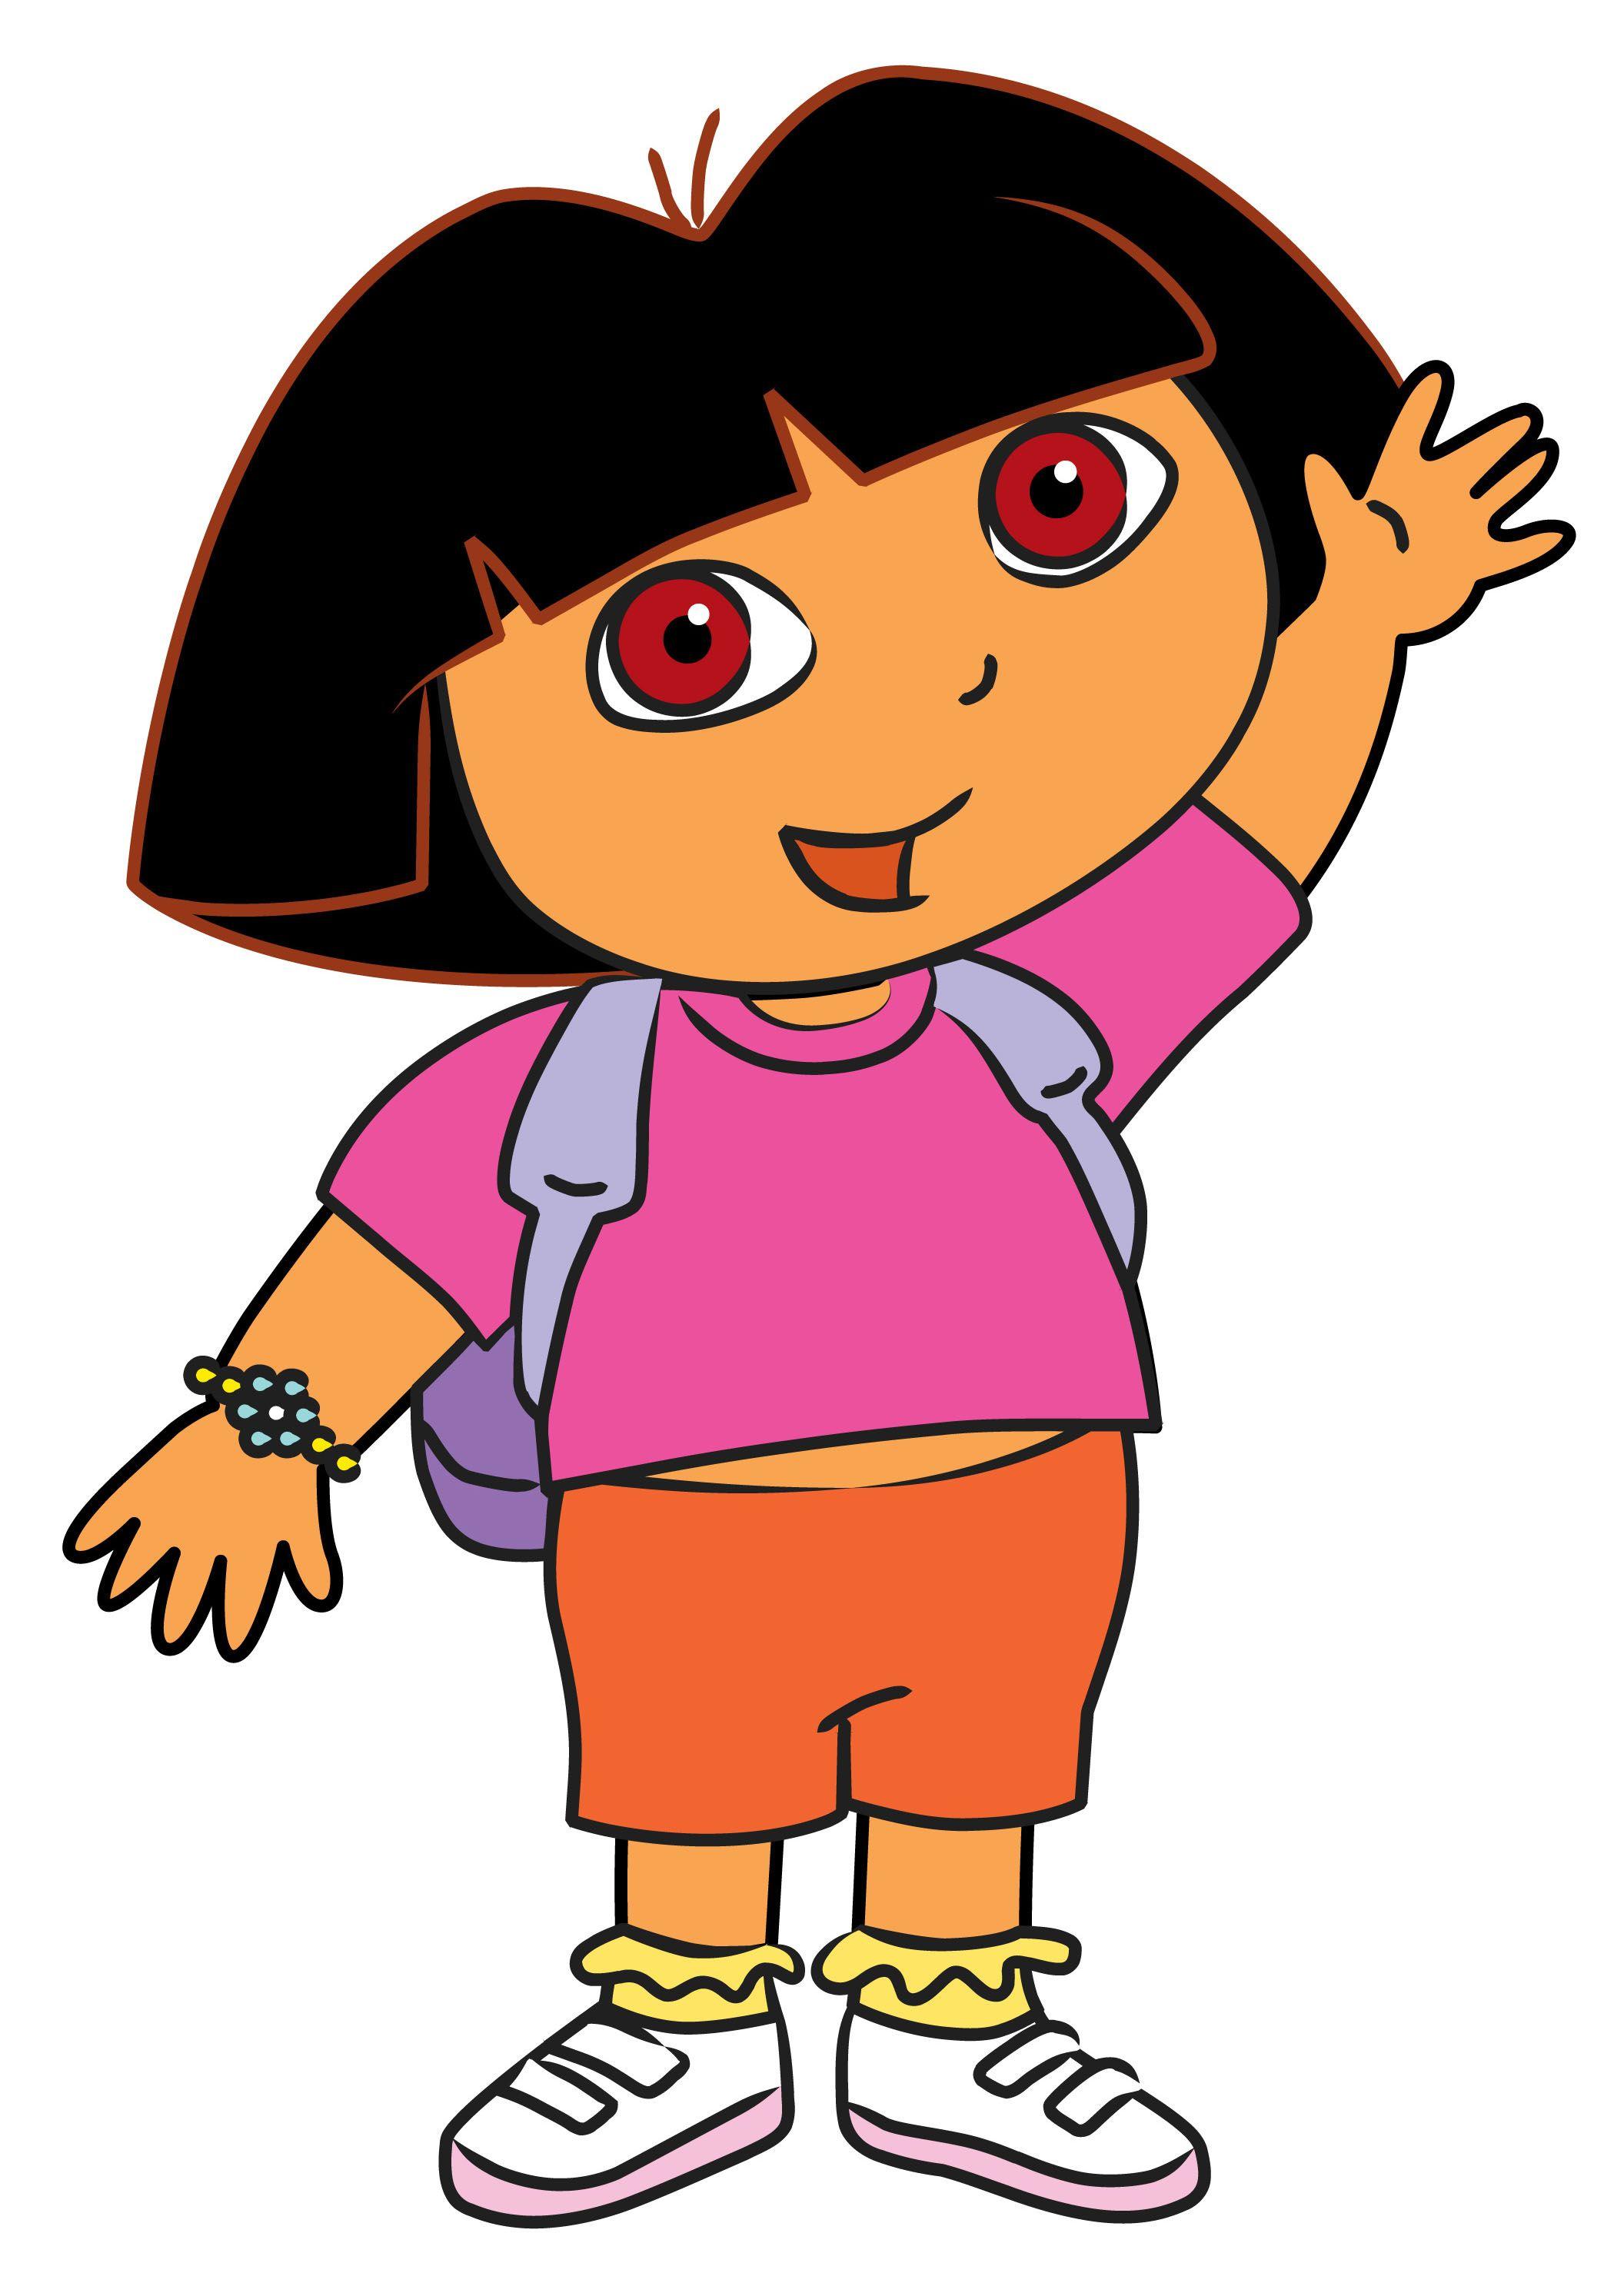 Draw Dora the Explorer | Templates | Pinterest | Birthdays